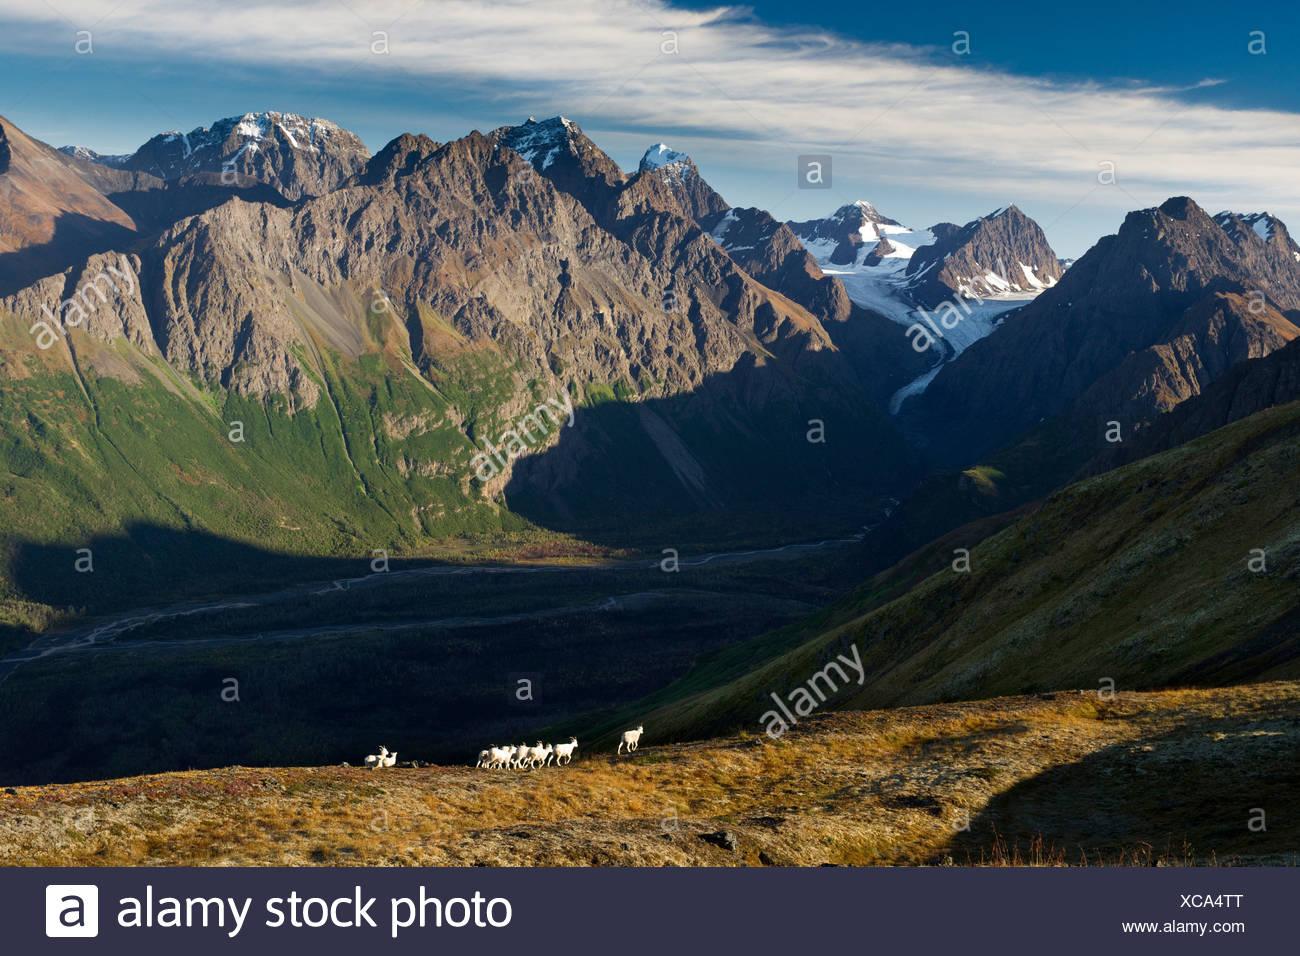 Dall Sheep on a ridge overlooking Eklutna River, Eklutna Glacier, Chugach State Park, Southcentral Alaska, Autumn - Stock Image